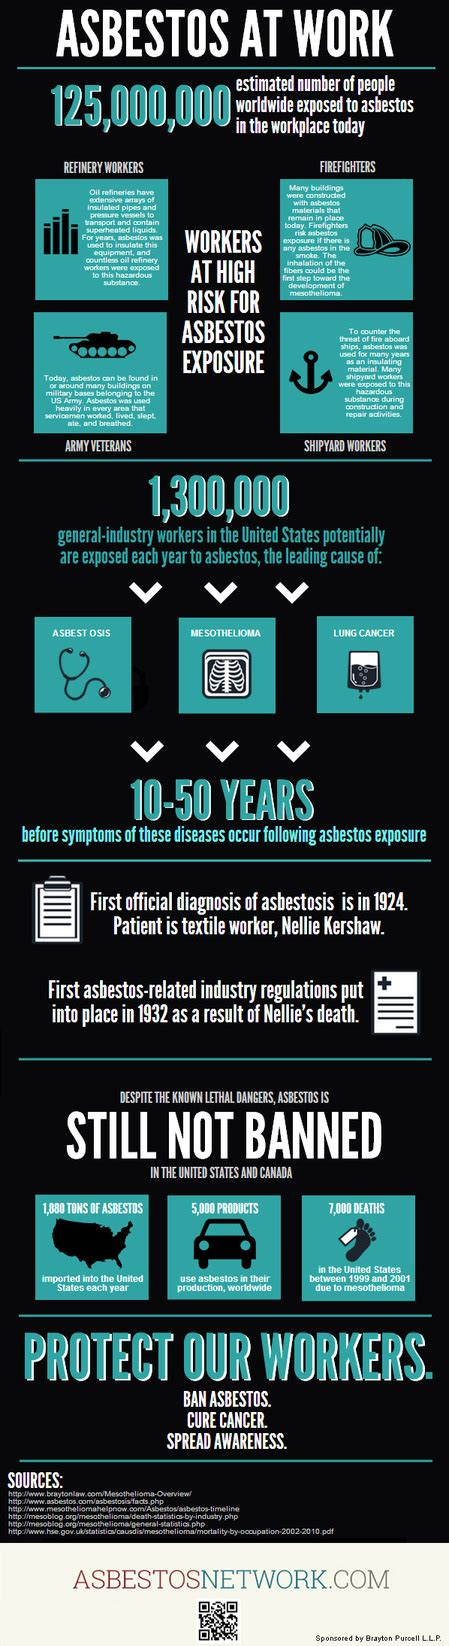 asbestos infographic occupational exposure